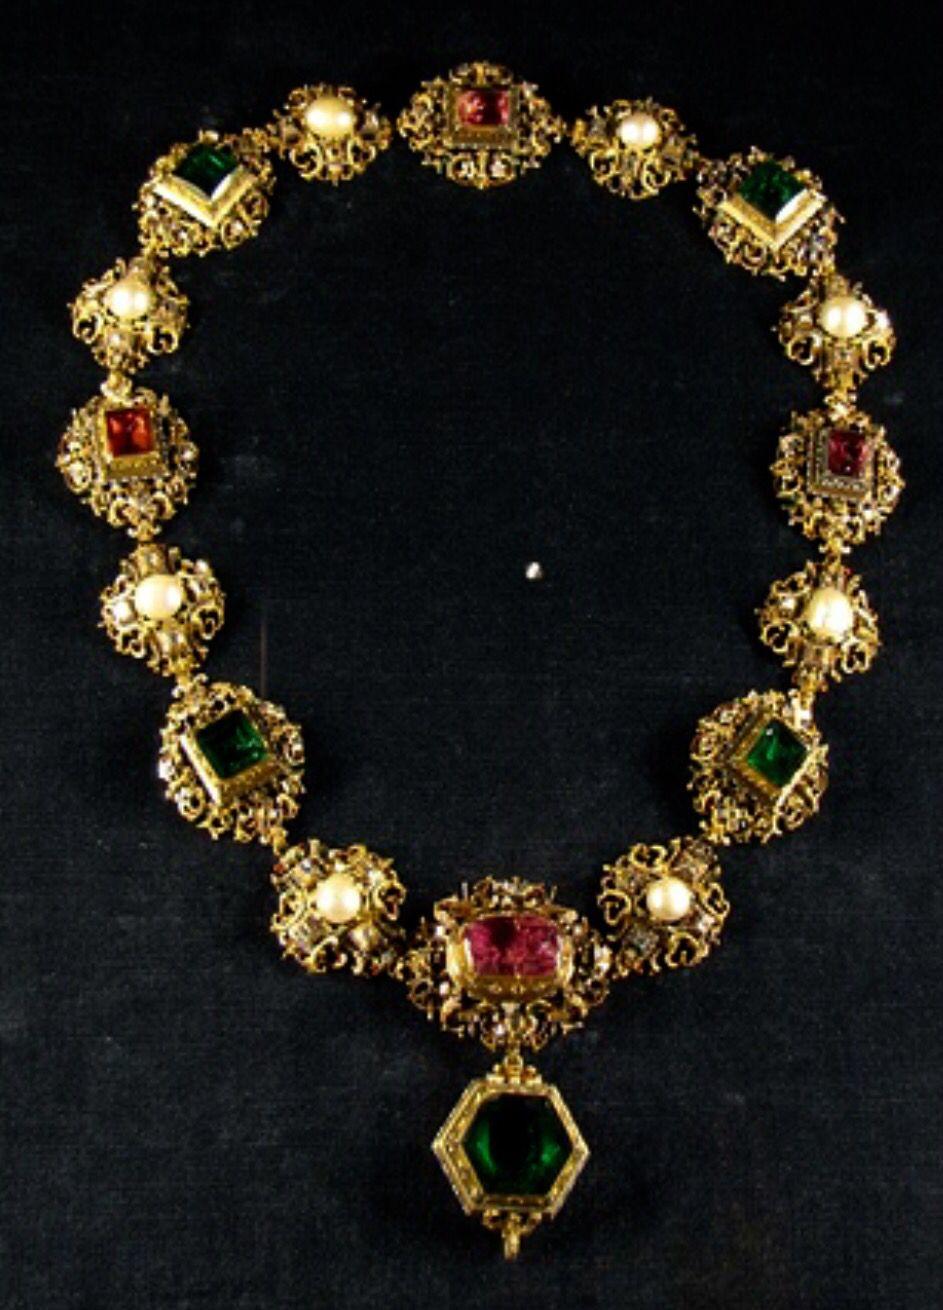 russian crown jewel necklace jewelry vii jewelry